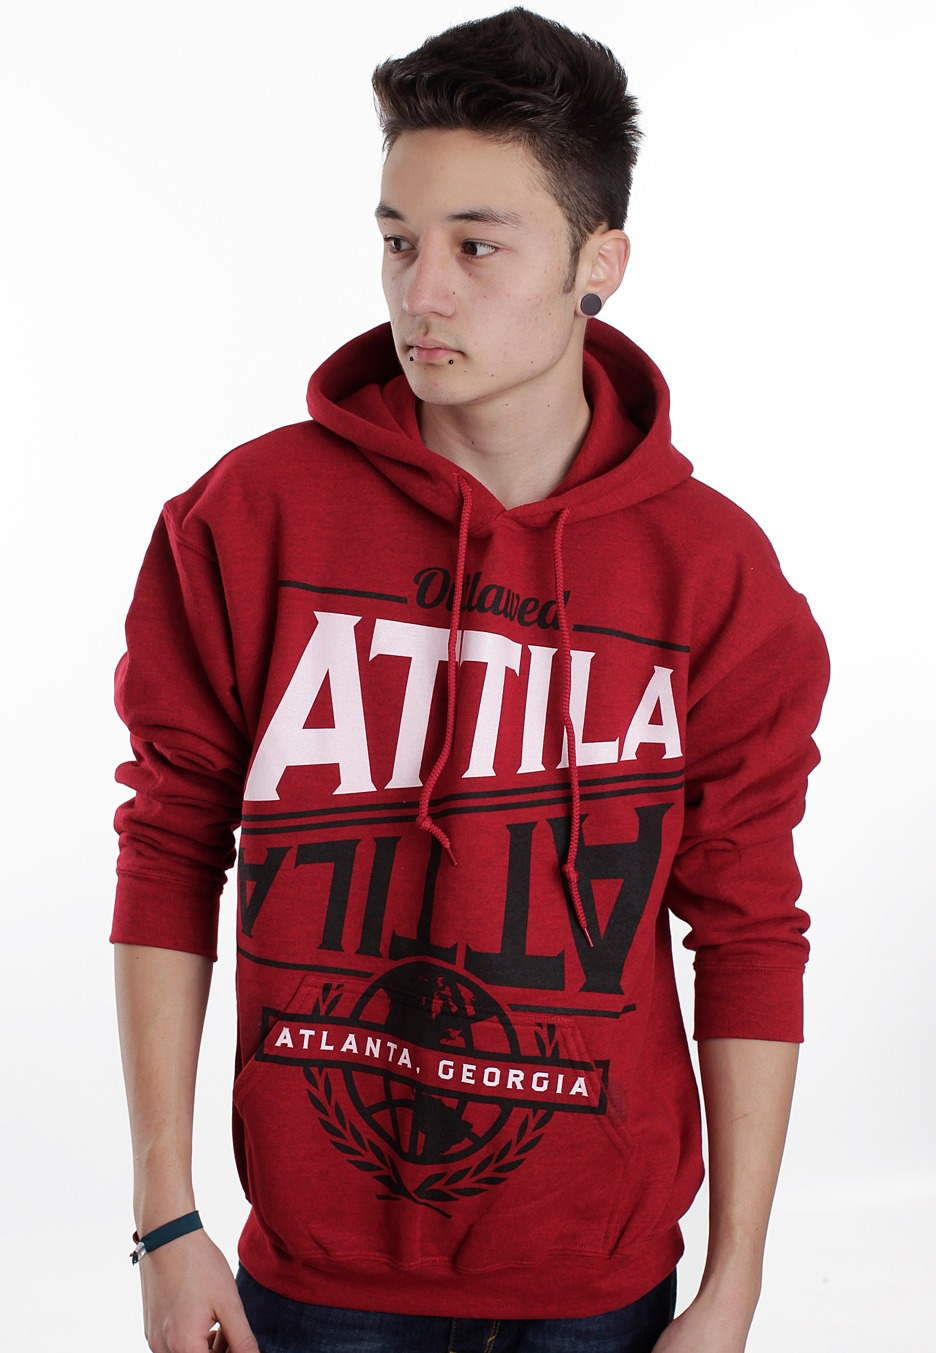 Attila hoodie